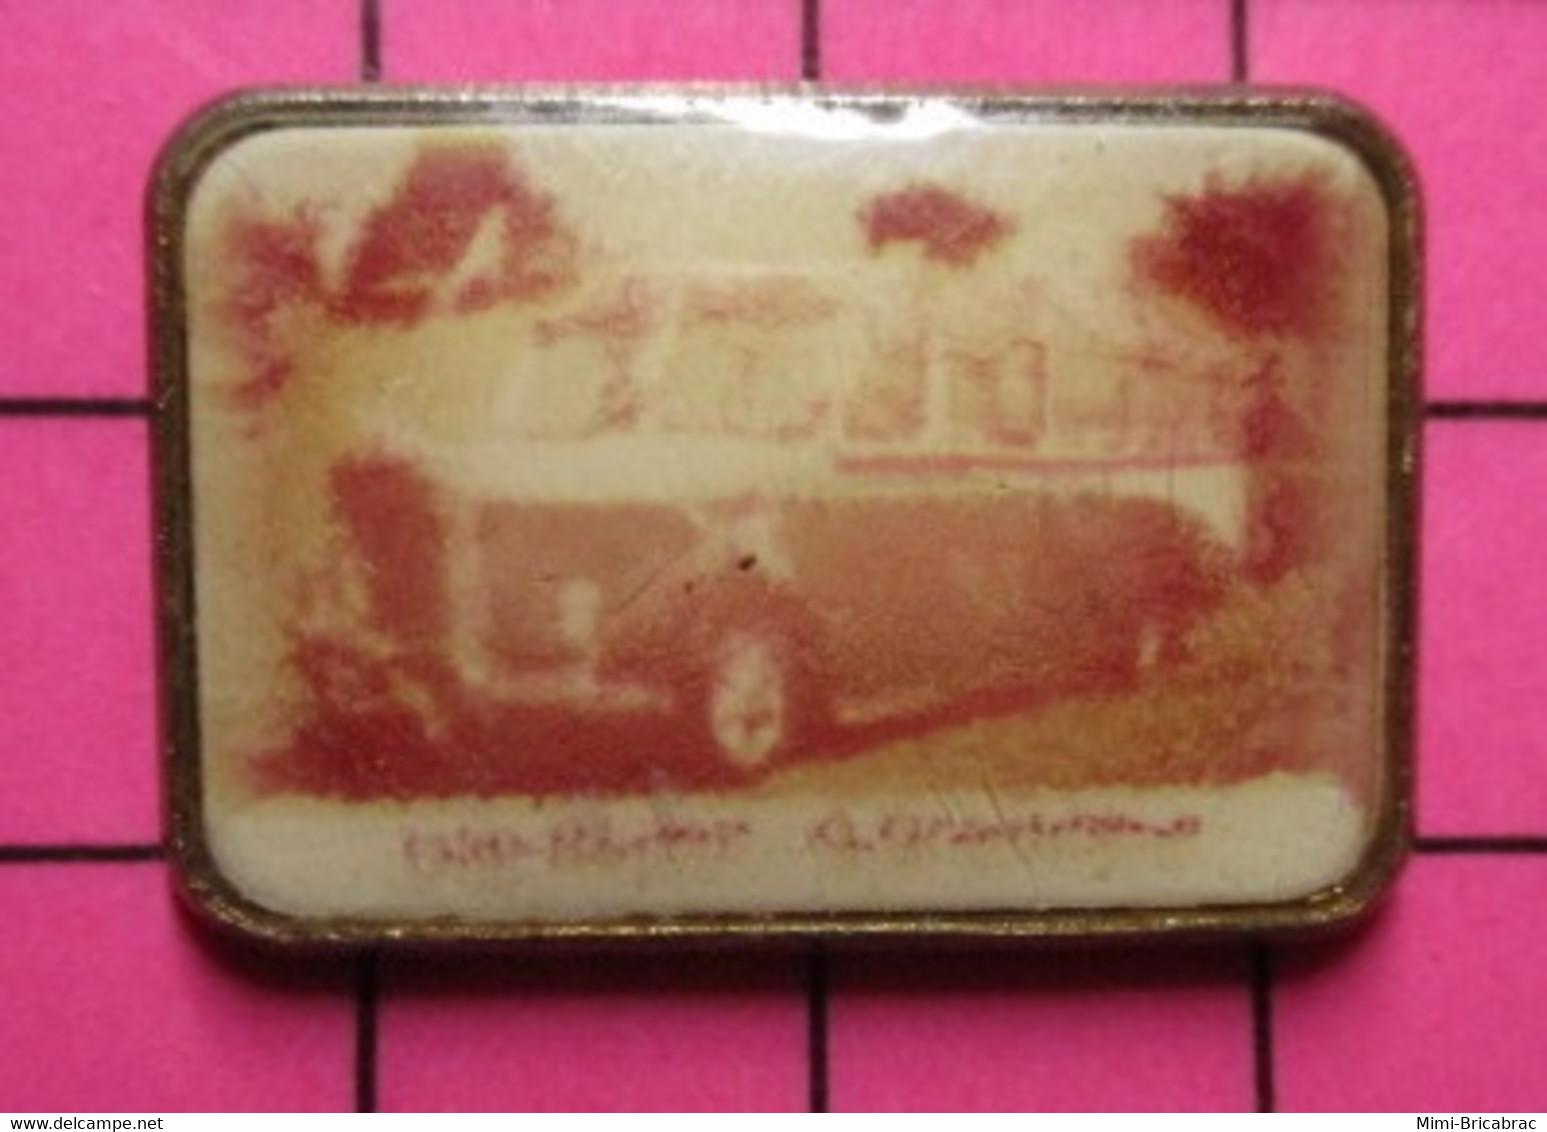 SP03 Pin's Pins / Beau Et Rare / THEME : TRANSPORTS / AUTOBUS ANNEES 40 NON IDENTIFIABLE - Marche